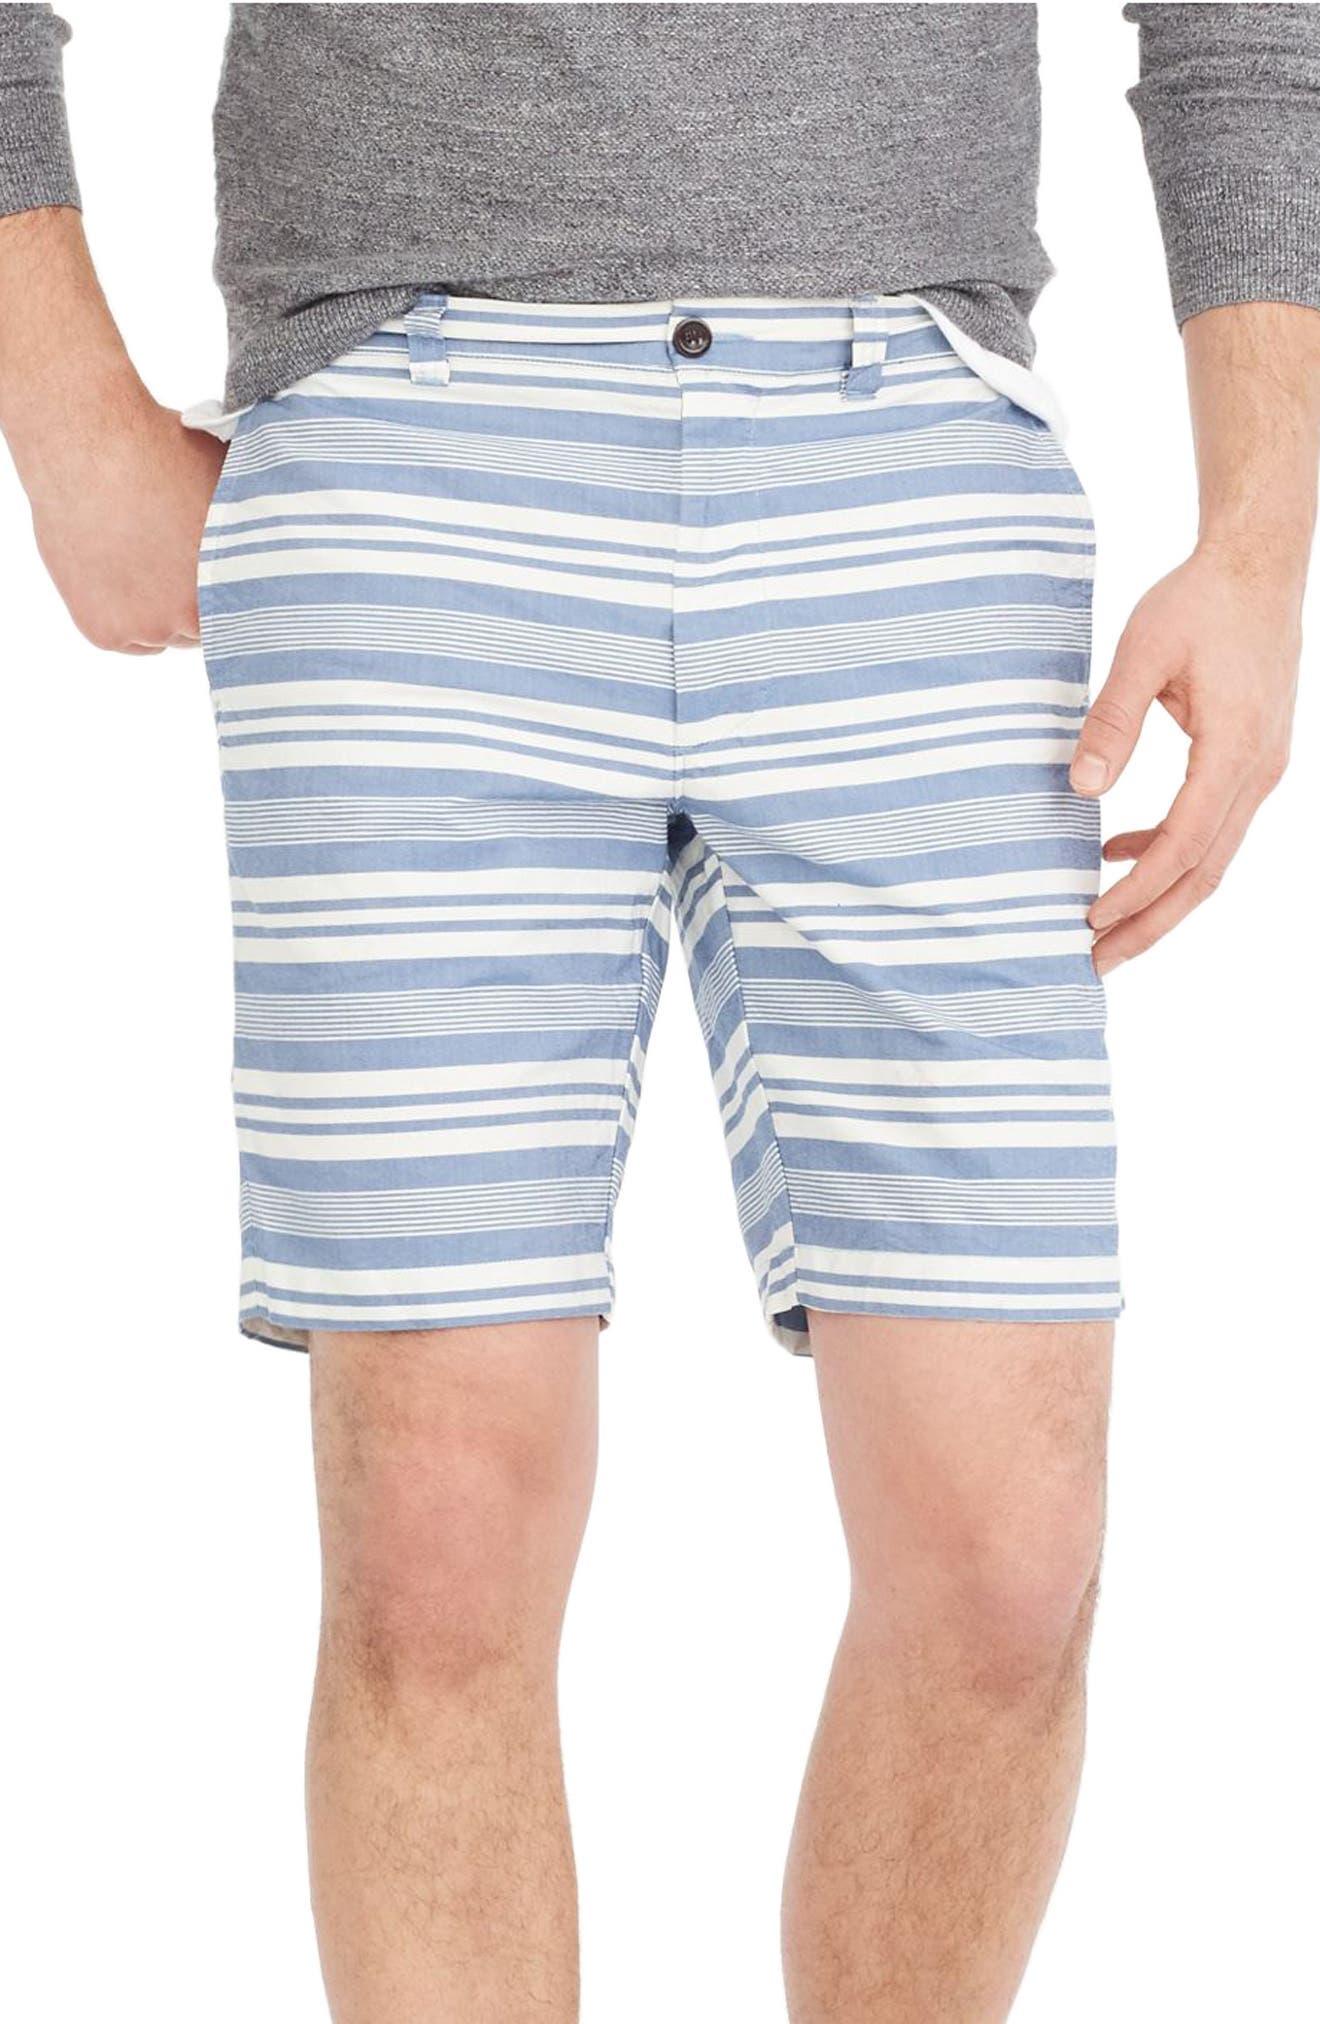 Stripe Oxford Shorts,                             Main thumbnail 1, color,                             400